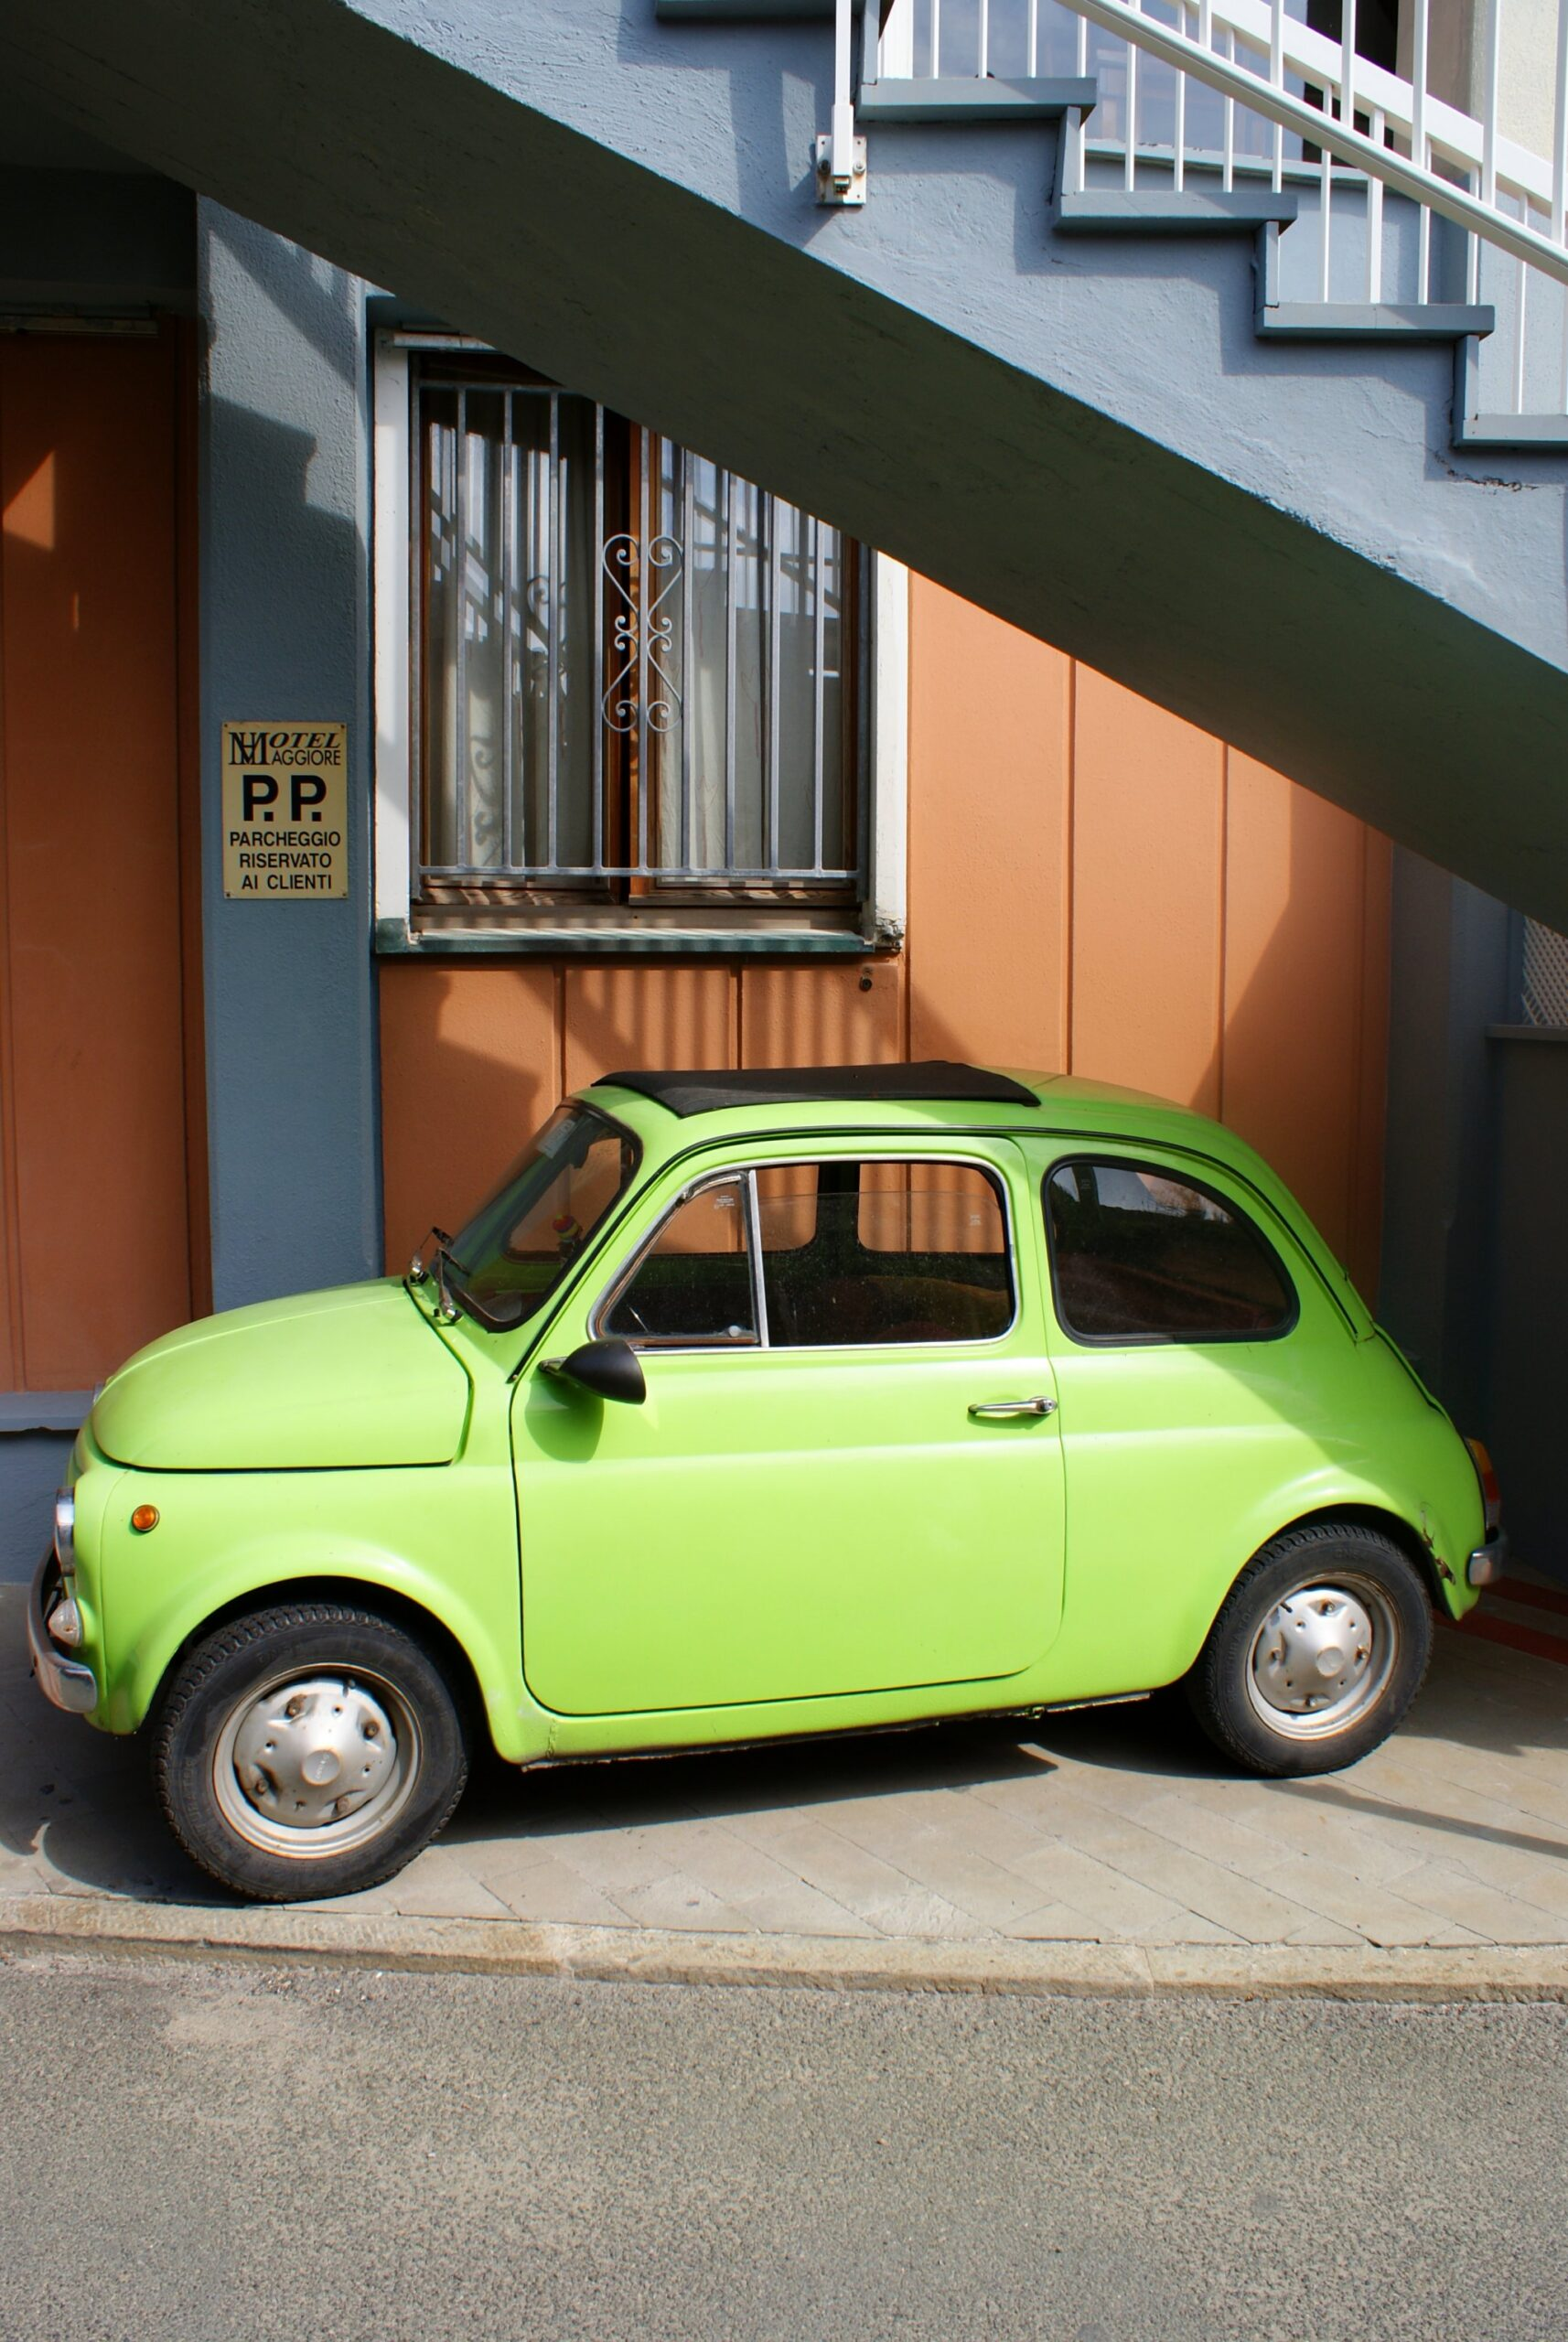 italian 500 vintage photo